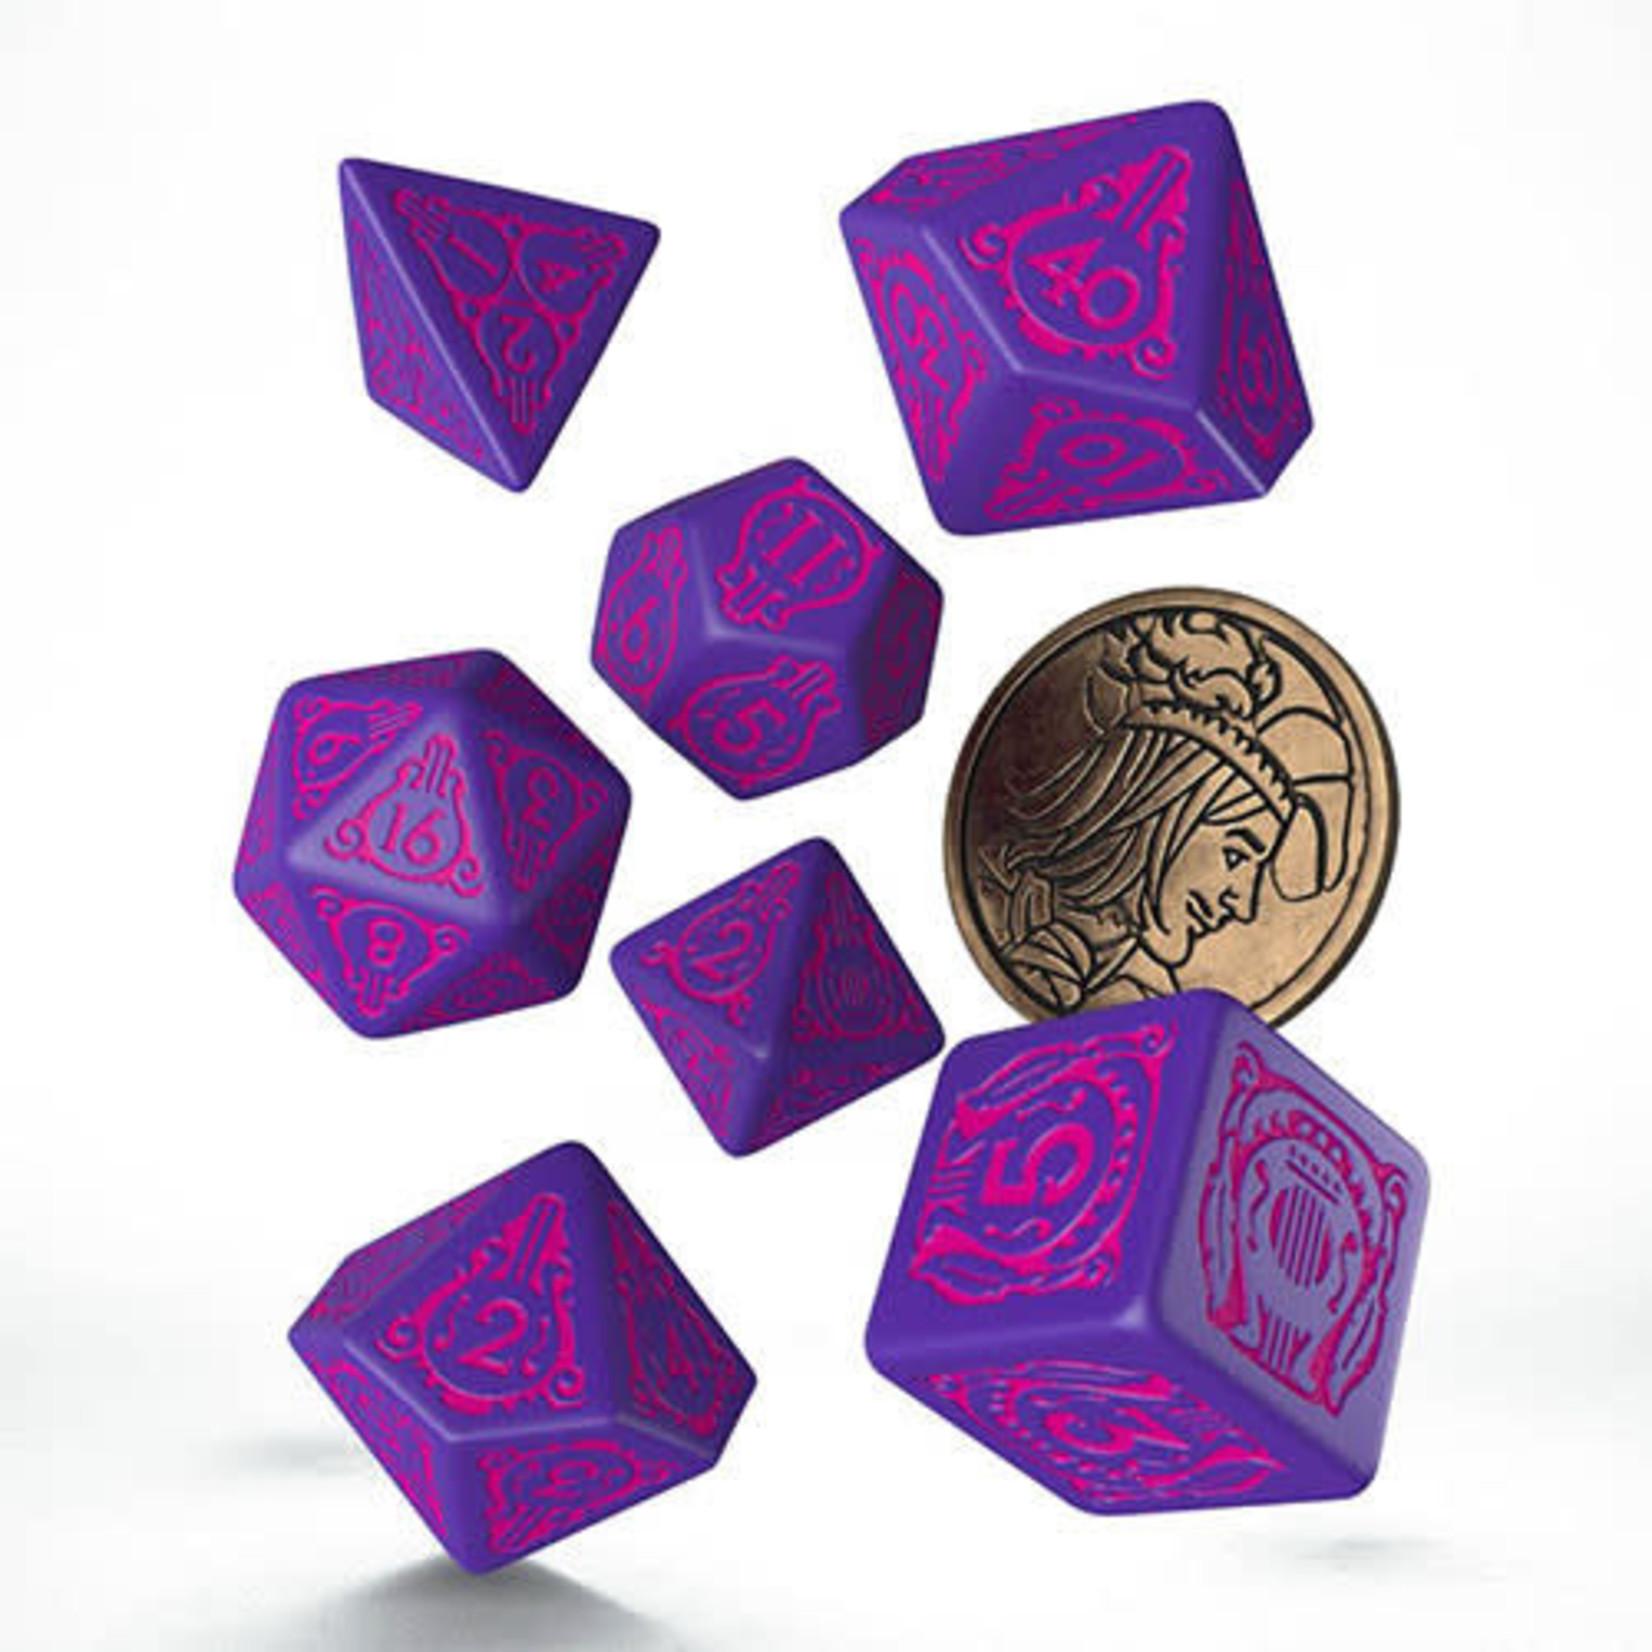 Witcher 7 Set Dandelion Conqueros of Hearts